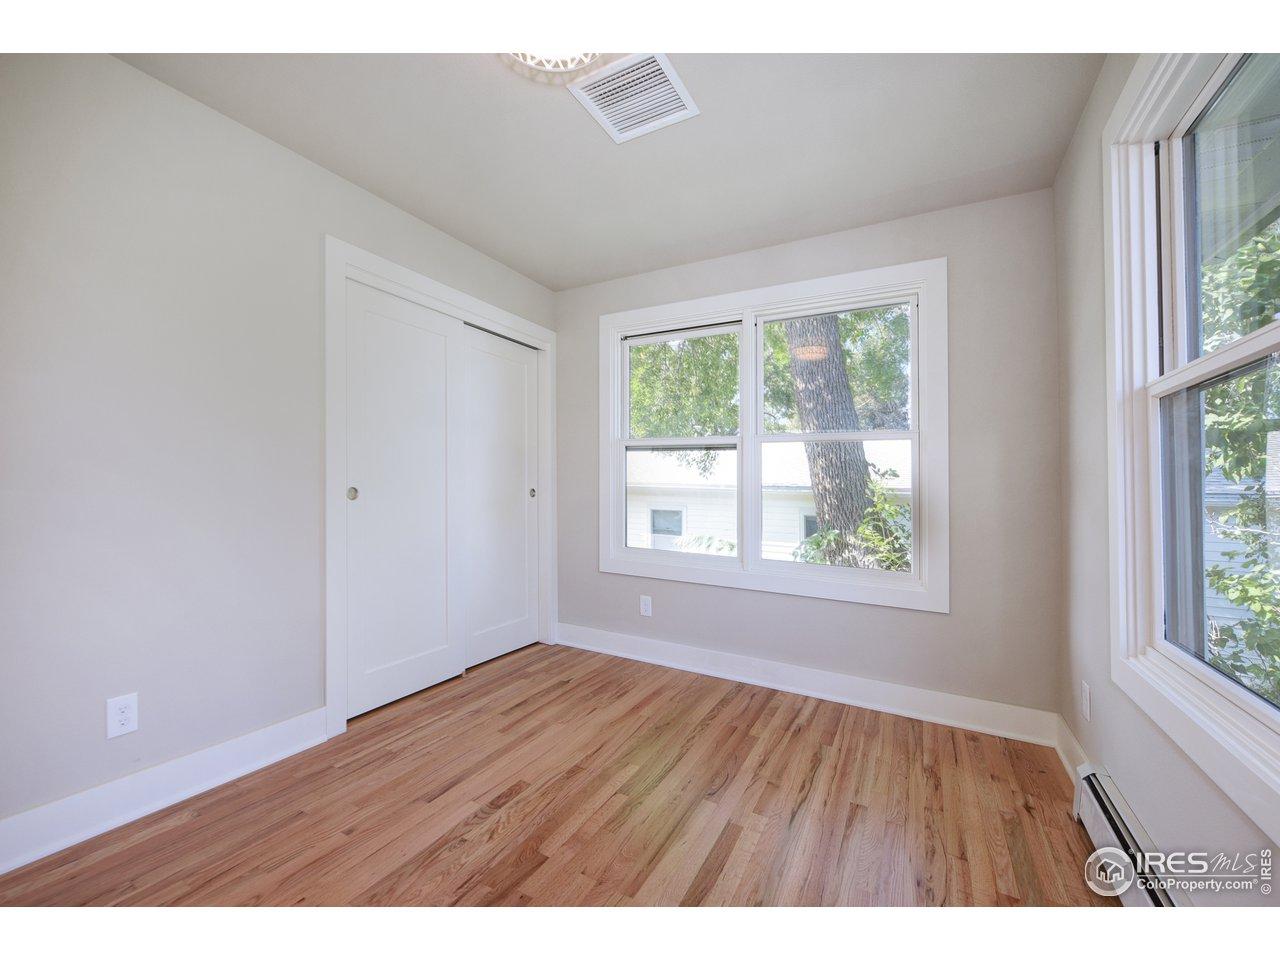 2nd bedroom on main floor